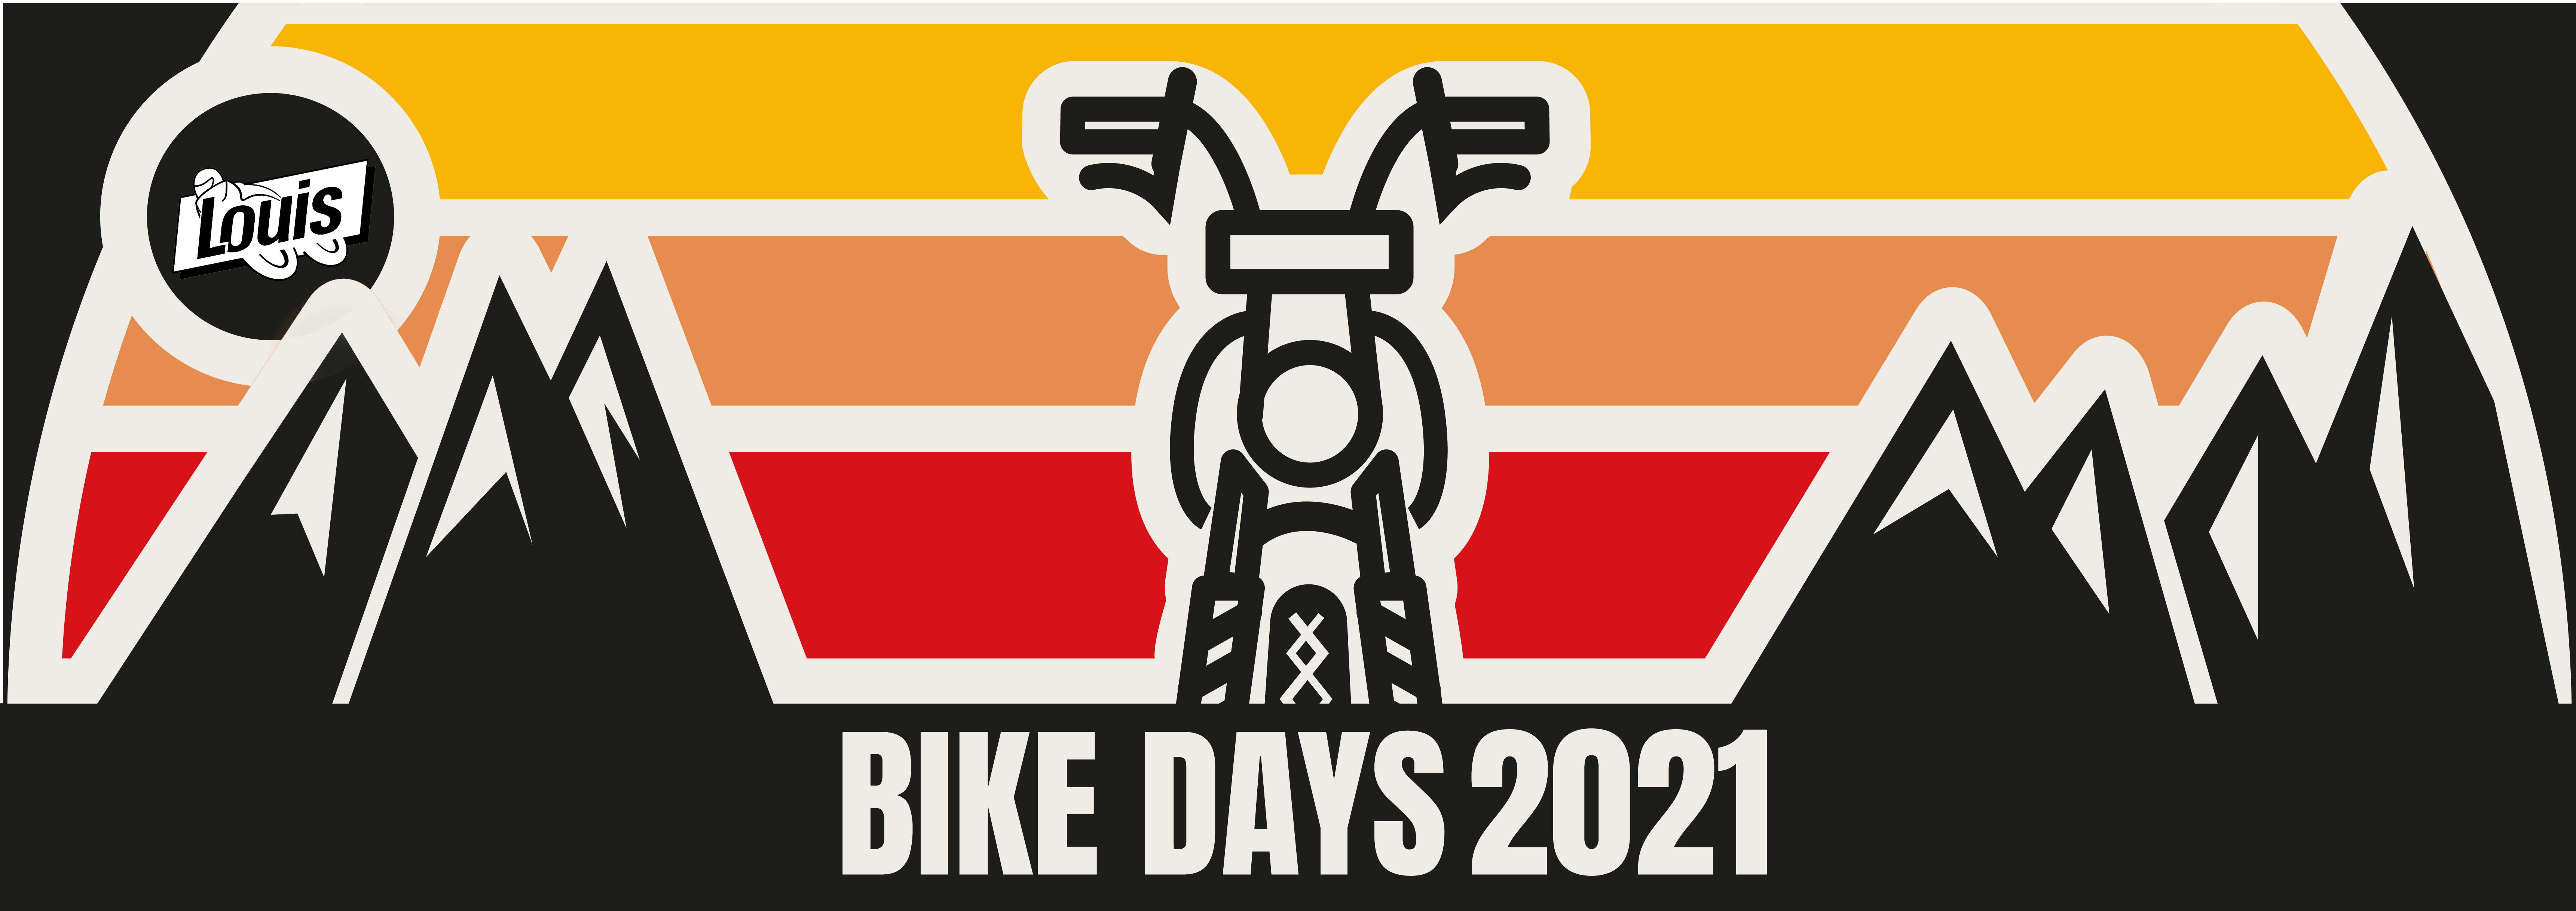 BIKE DAYS 2021